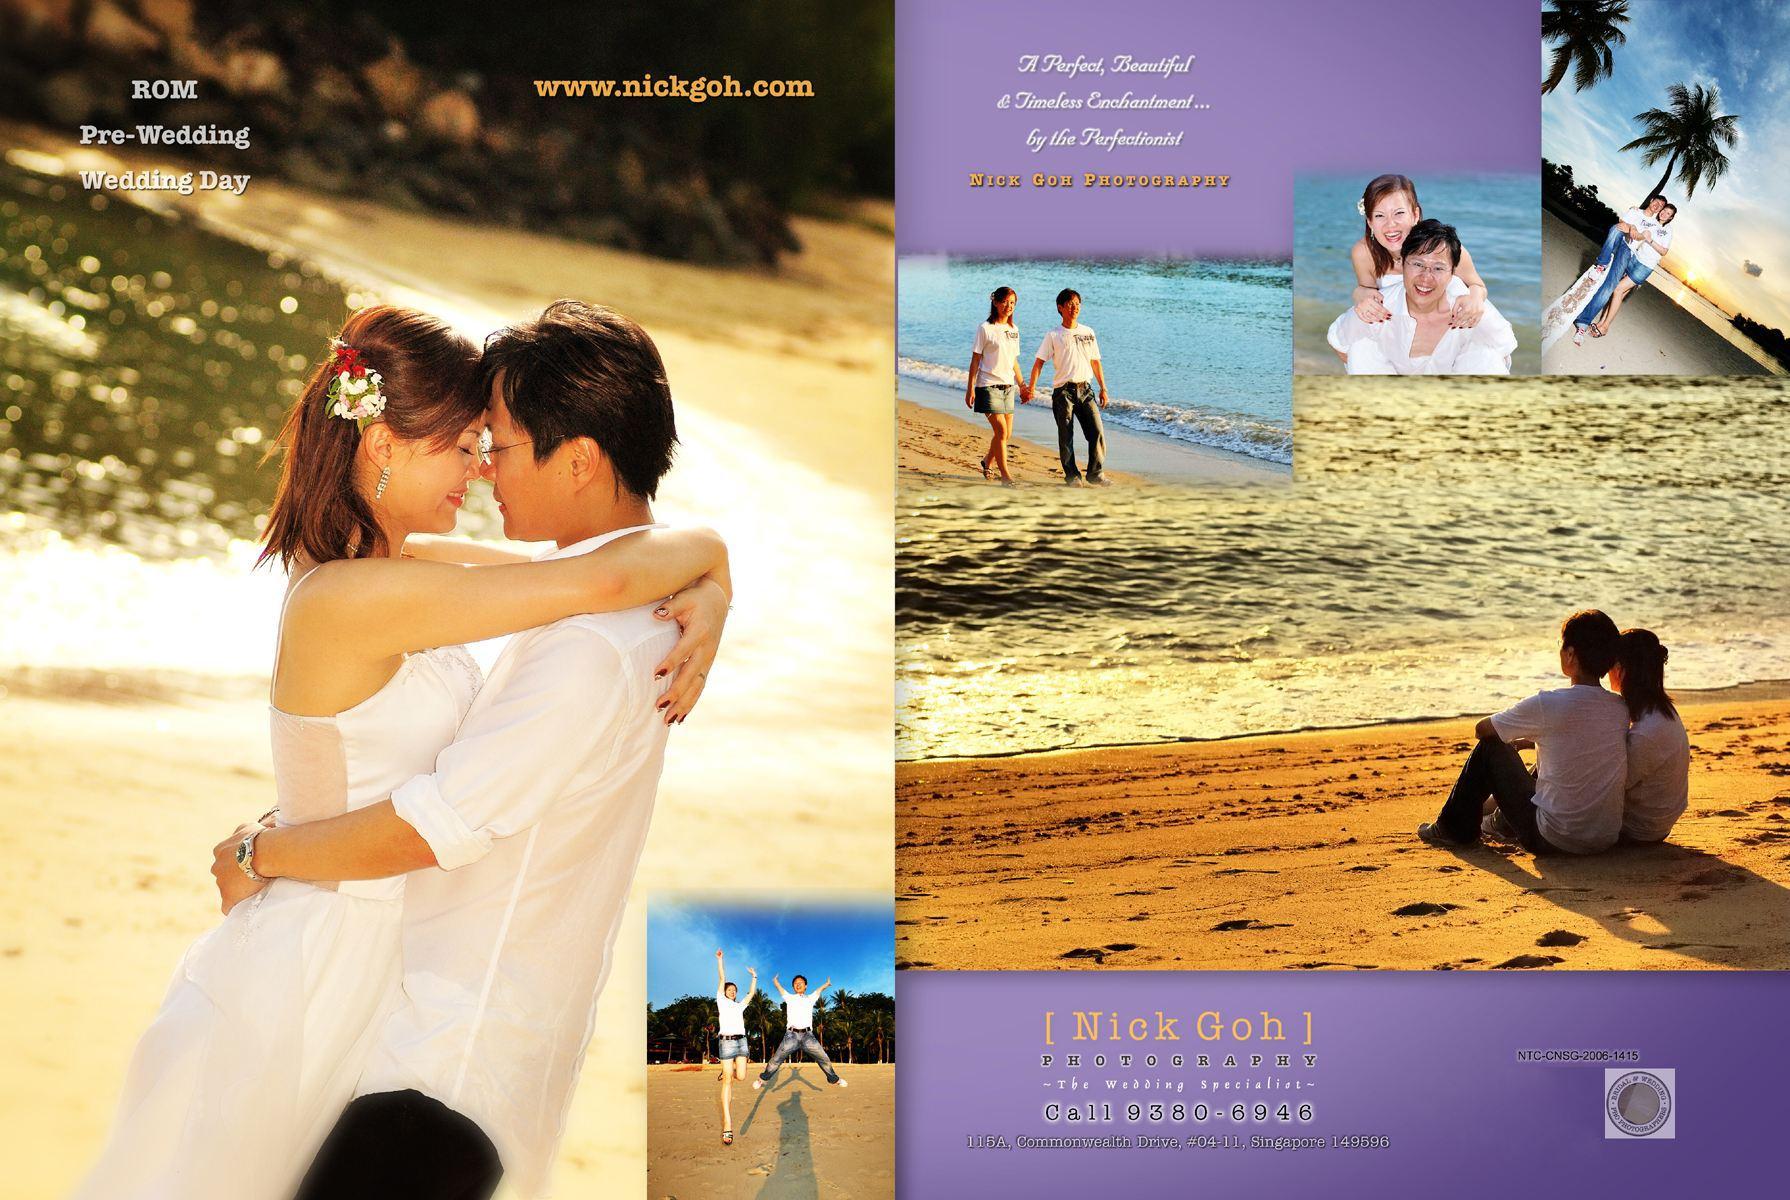 Wedding Bridal Photography - Nick Goh